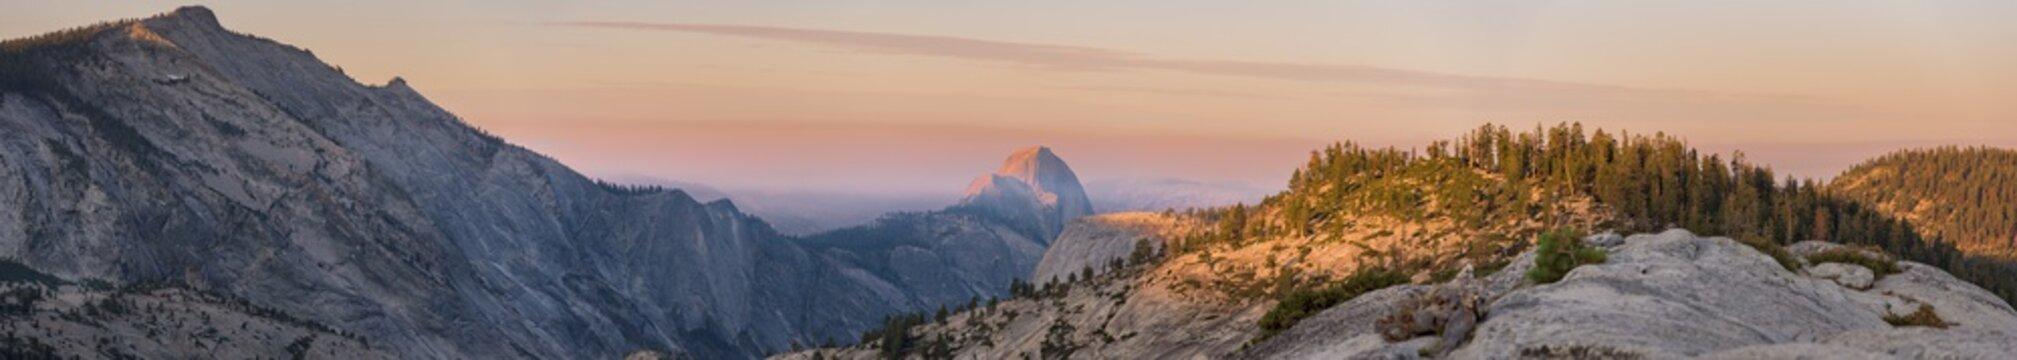 Sunrise above Half Dome in Yosemite National Park.